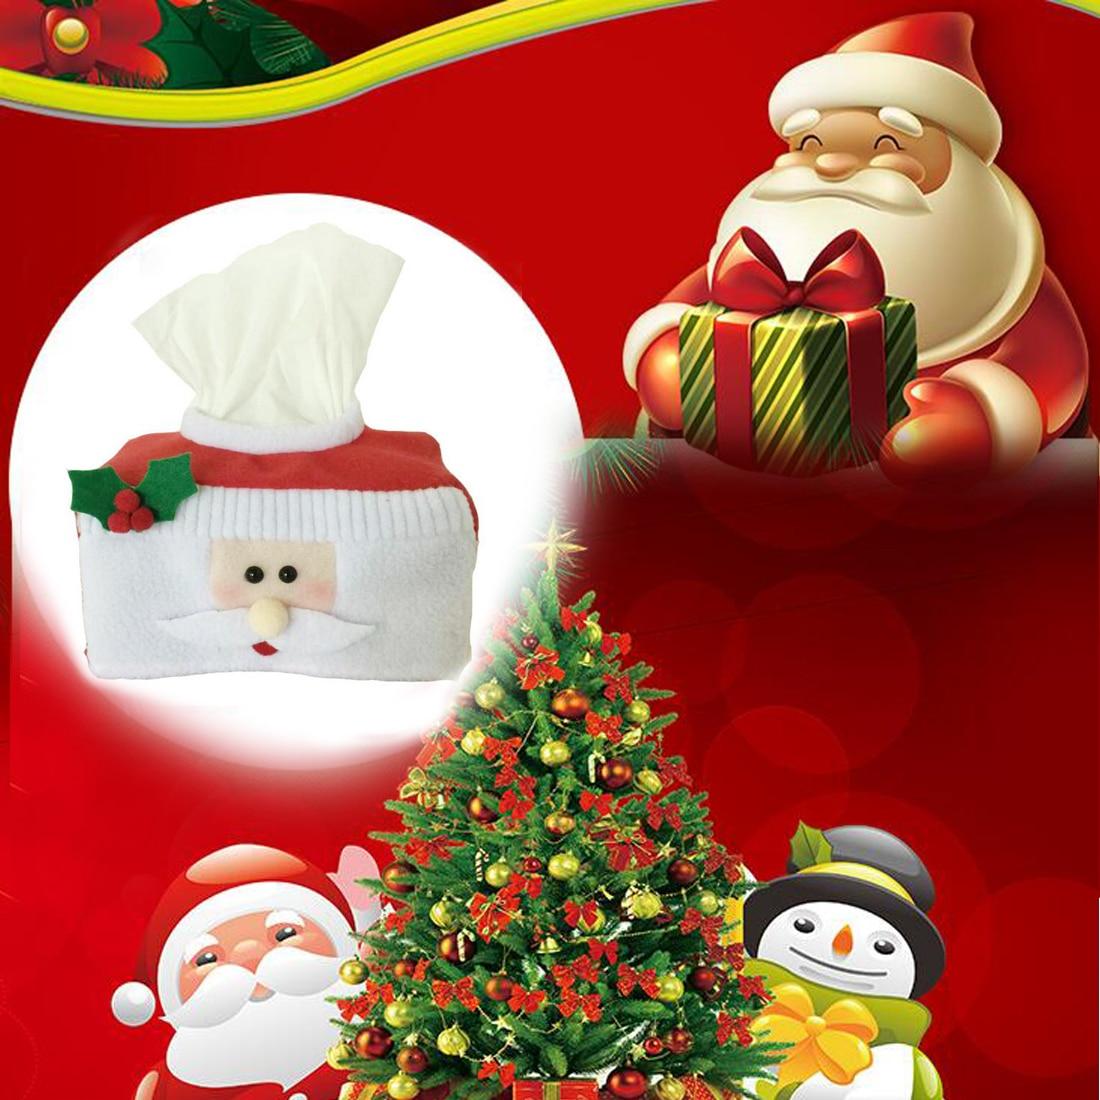 Cute santa claus towel christmas decor - Christmas Style Santa Claus Belt Felt Tissue Box Case Holder Home Decoration Vintage Creative Napkin Holder For Paper Towels